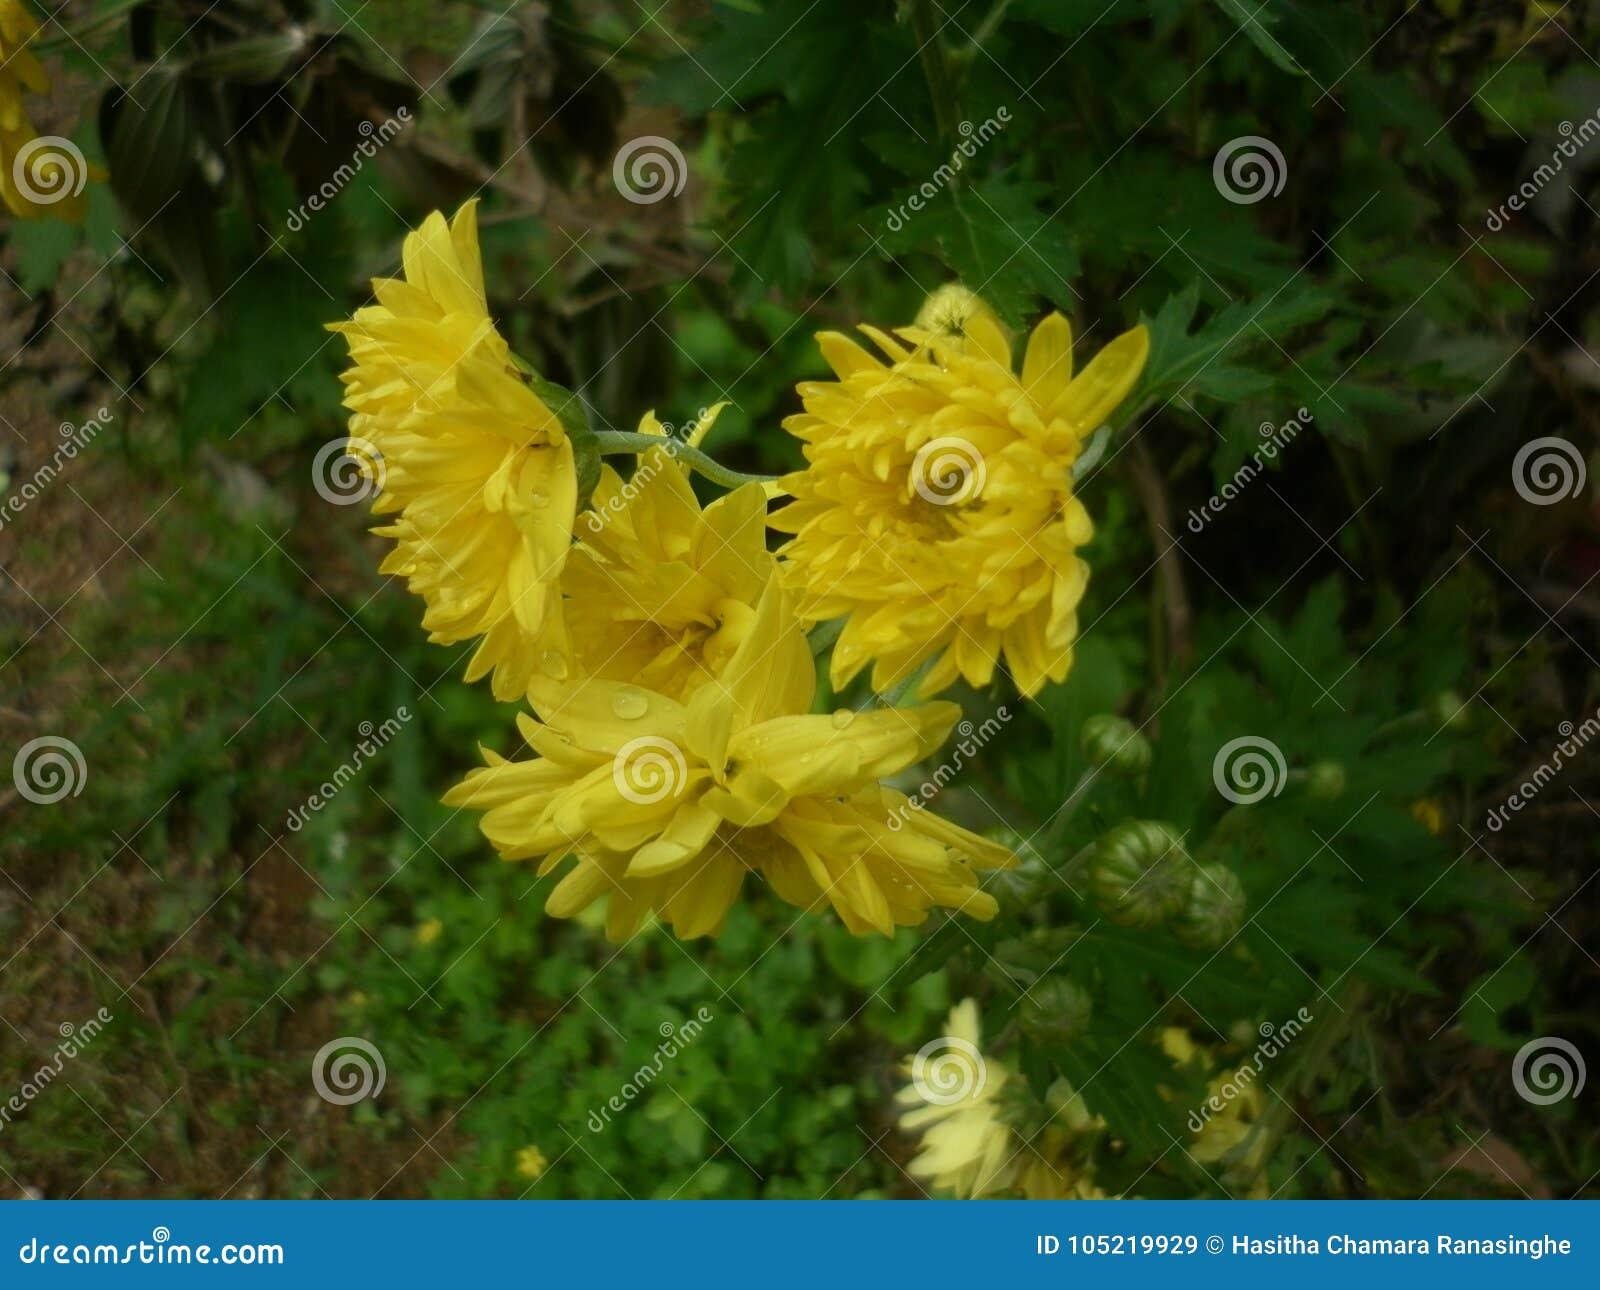 Sunshine Yellow Flowers Stock Image Image Of Nature 105219929